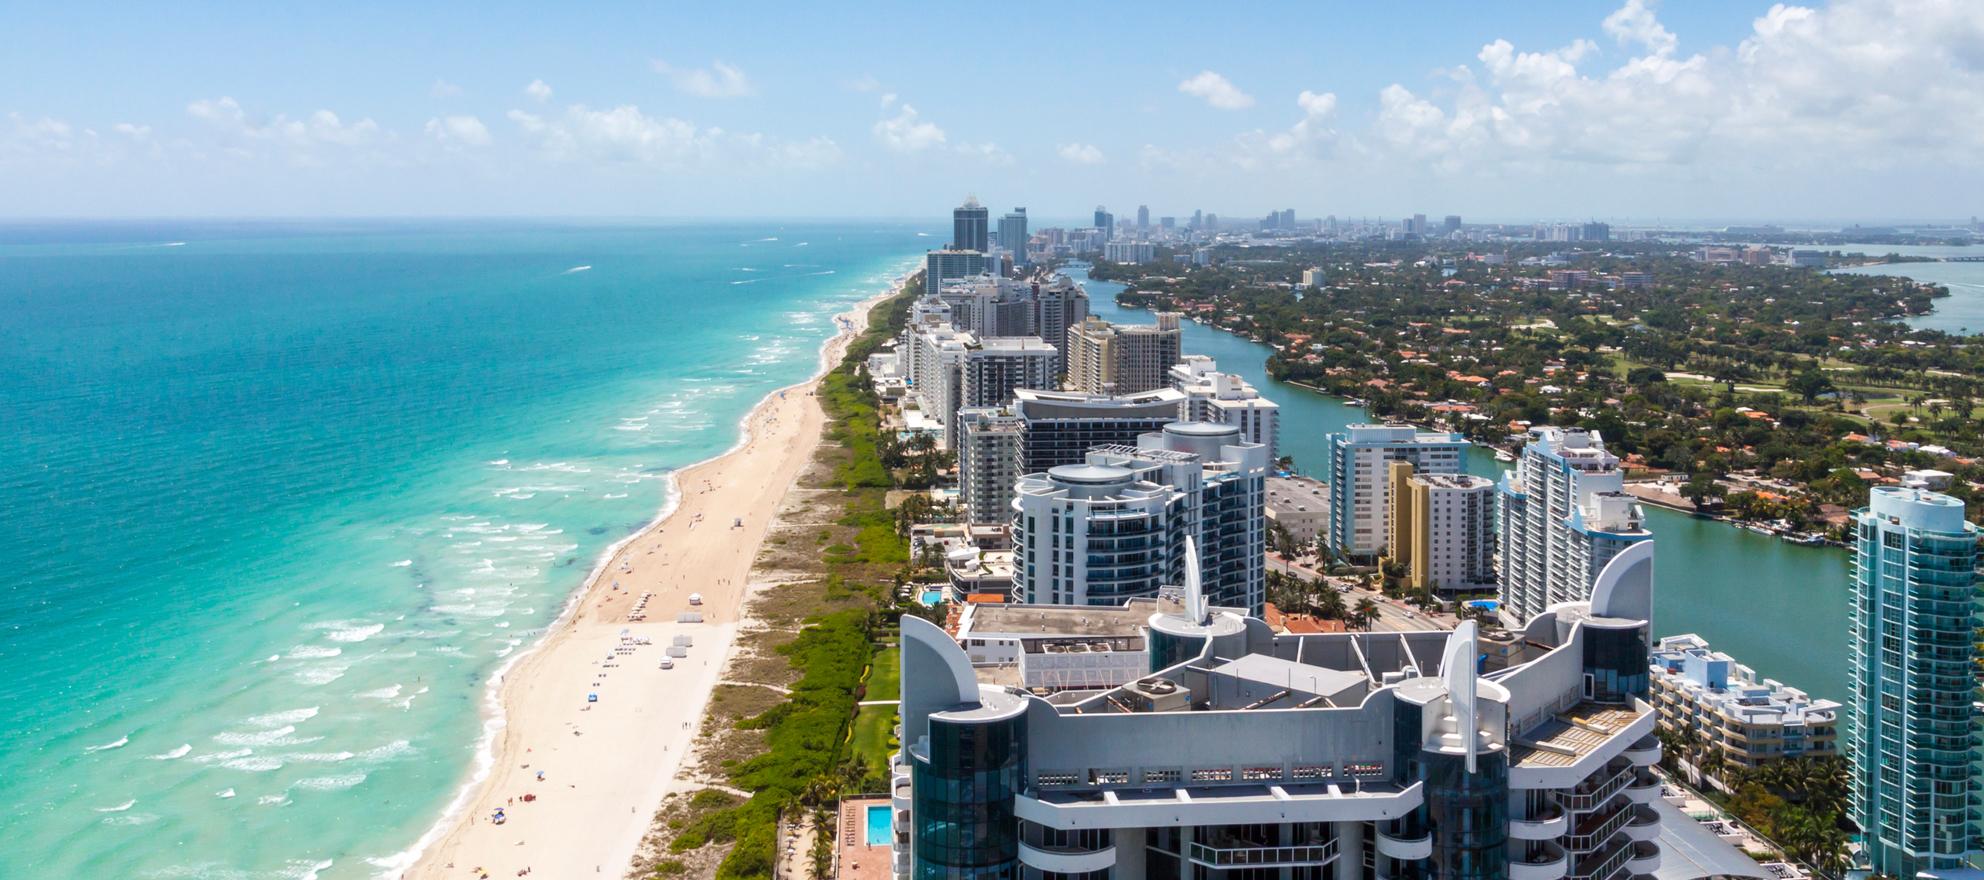 Miami Real House Price Index